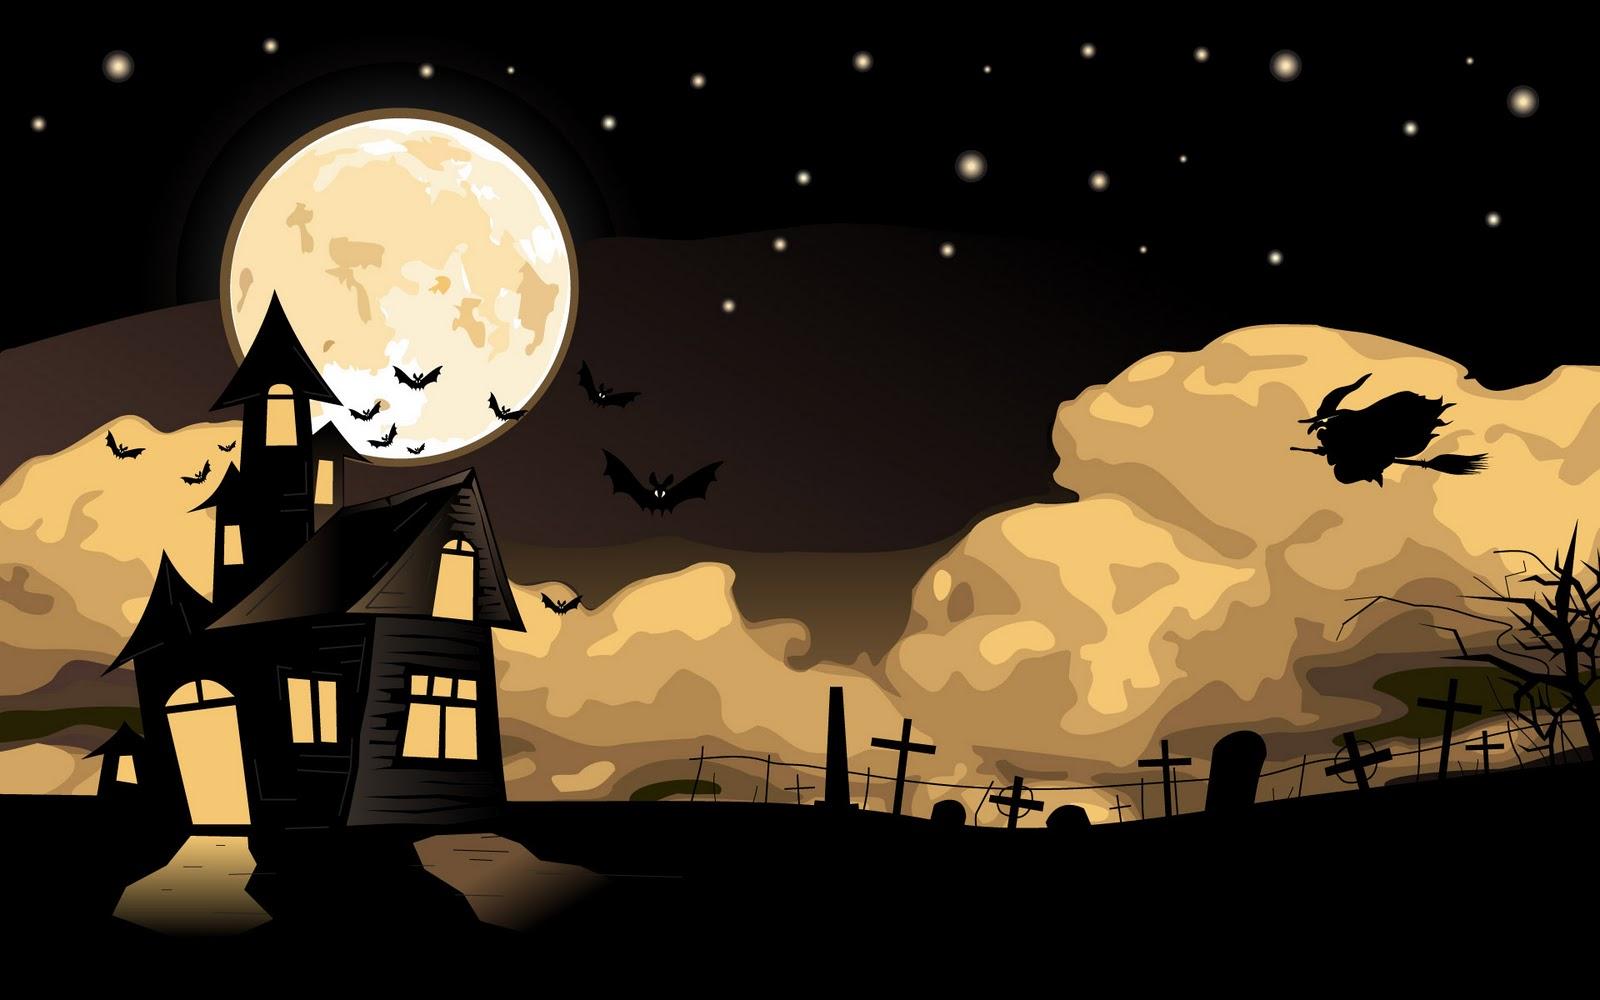 Free Animated Halloween Wallpaper - WallpaperSafari